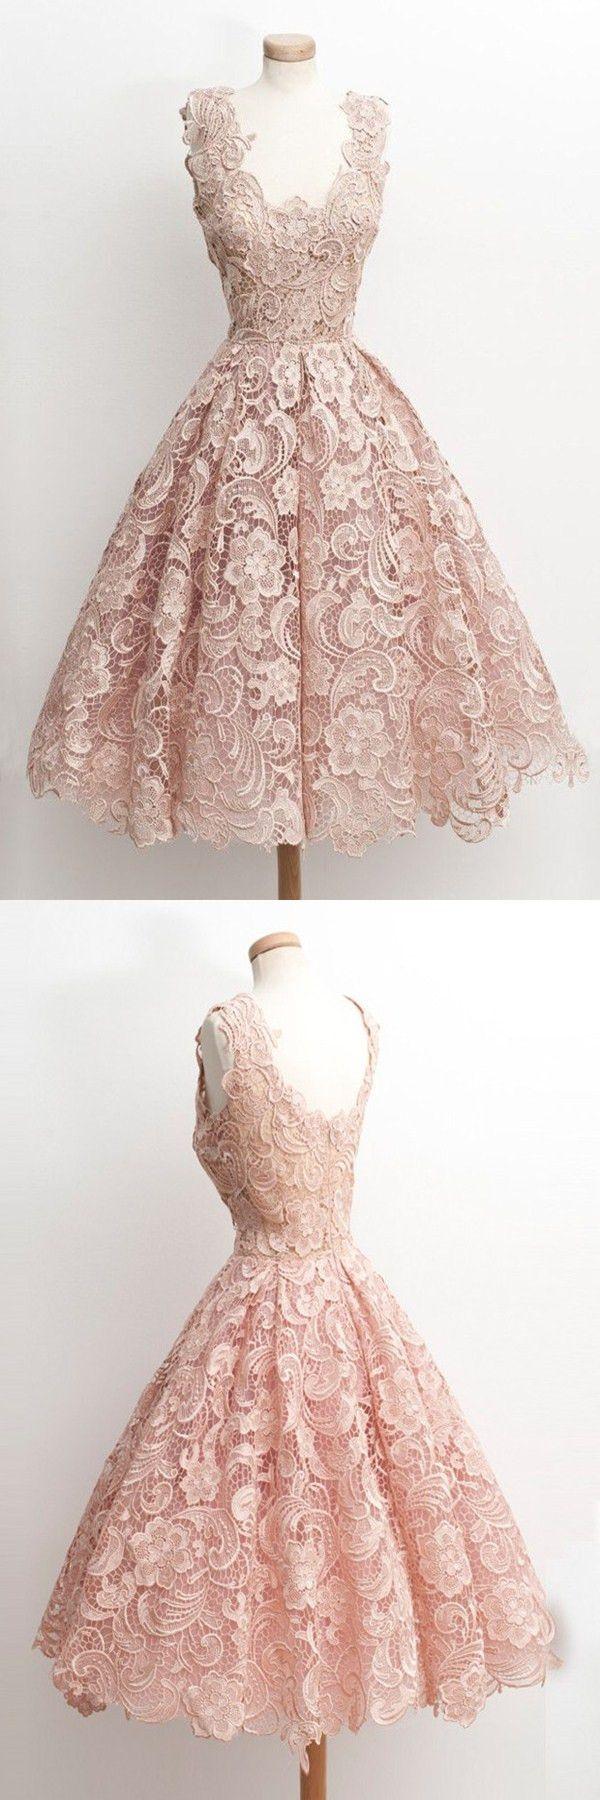 25 best vintage prom dresses ideas on pinterest disney